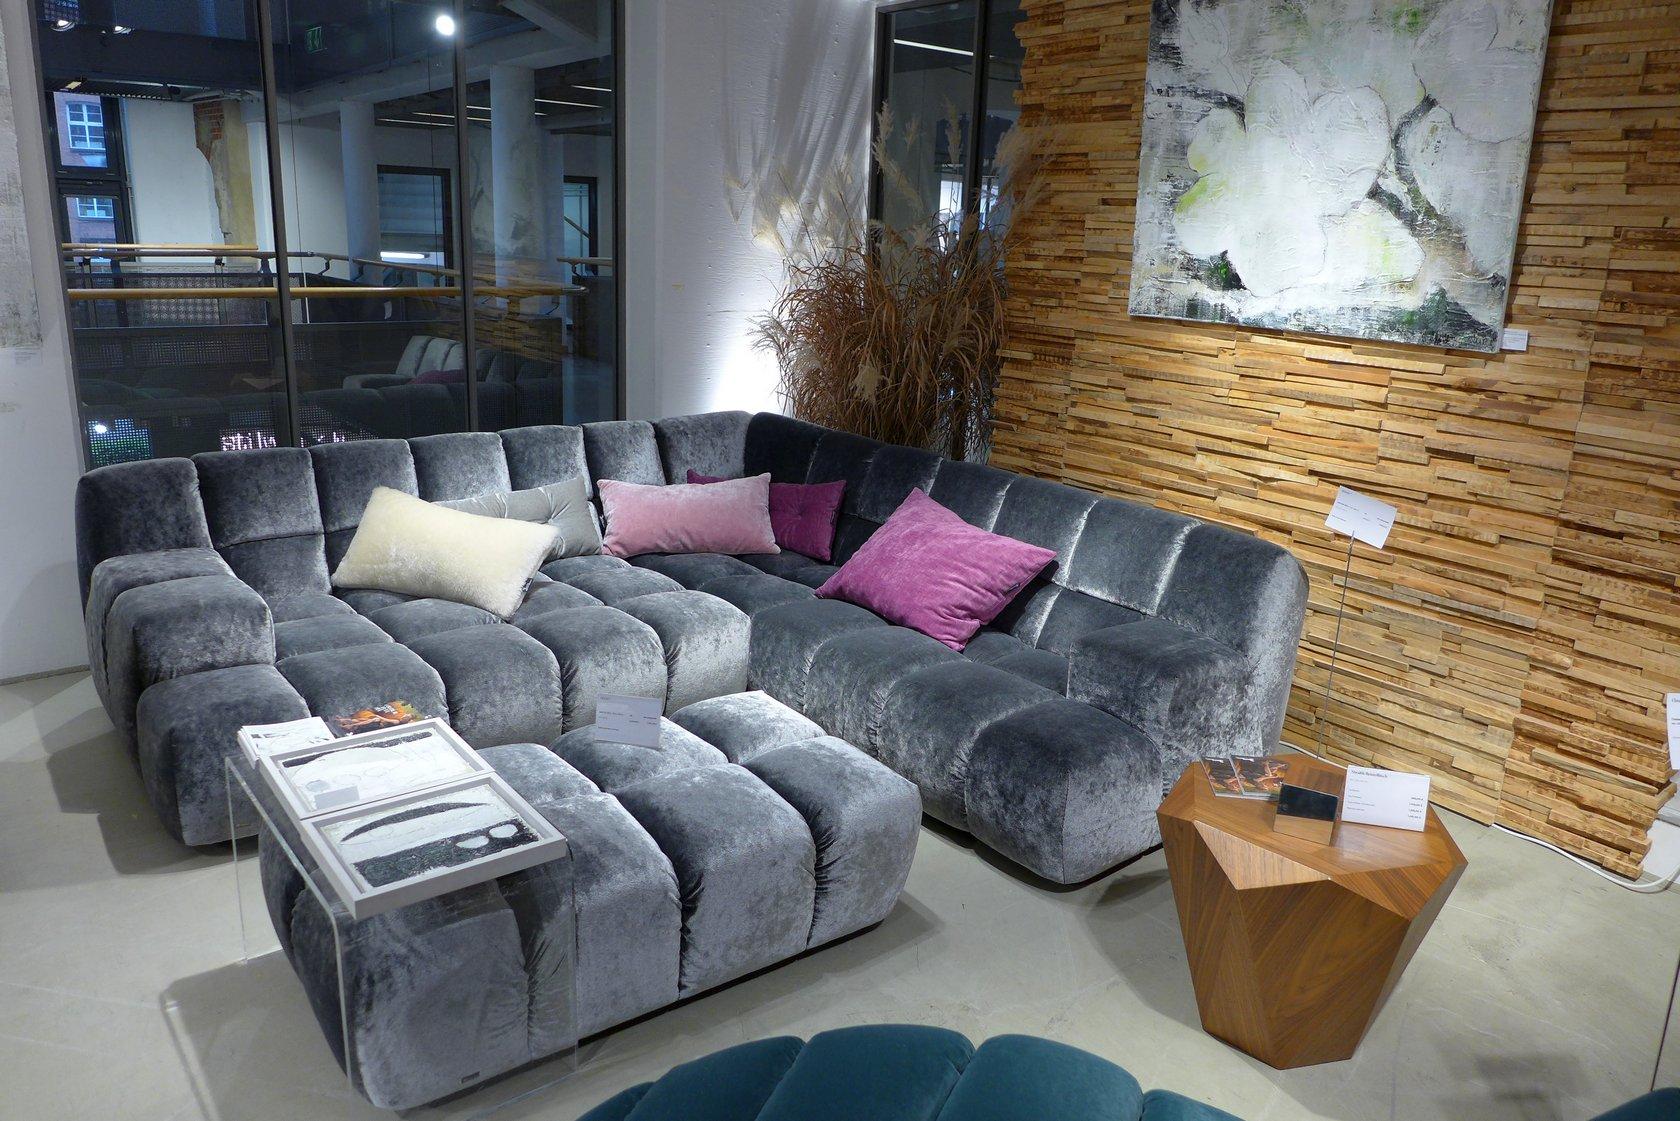 bretz flagship store hamburg stilwerk 2017 06 13 012 bretz store hamburg. Black Bedroom Furniture Sets. Home Design Ideas